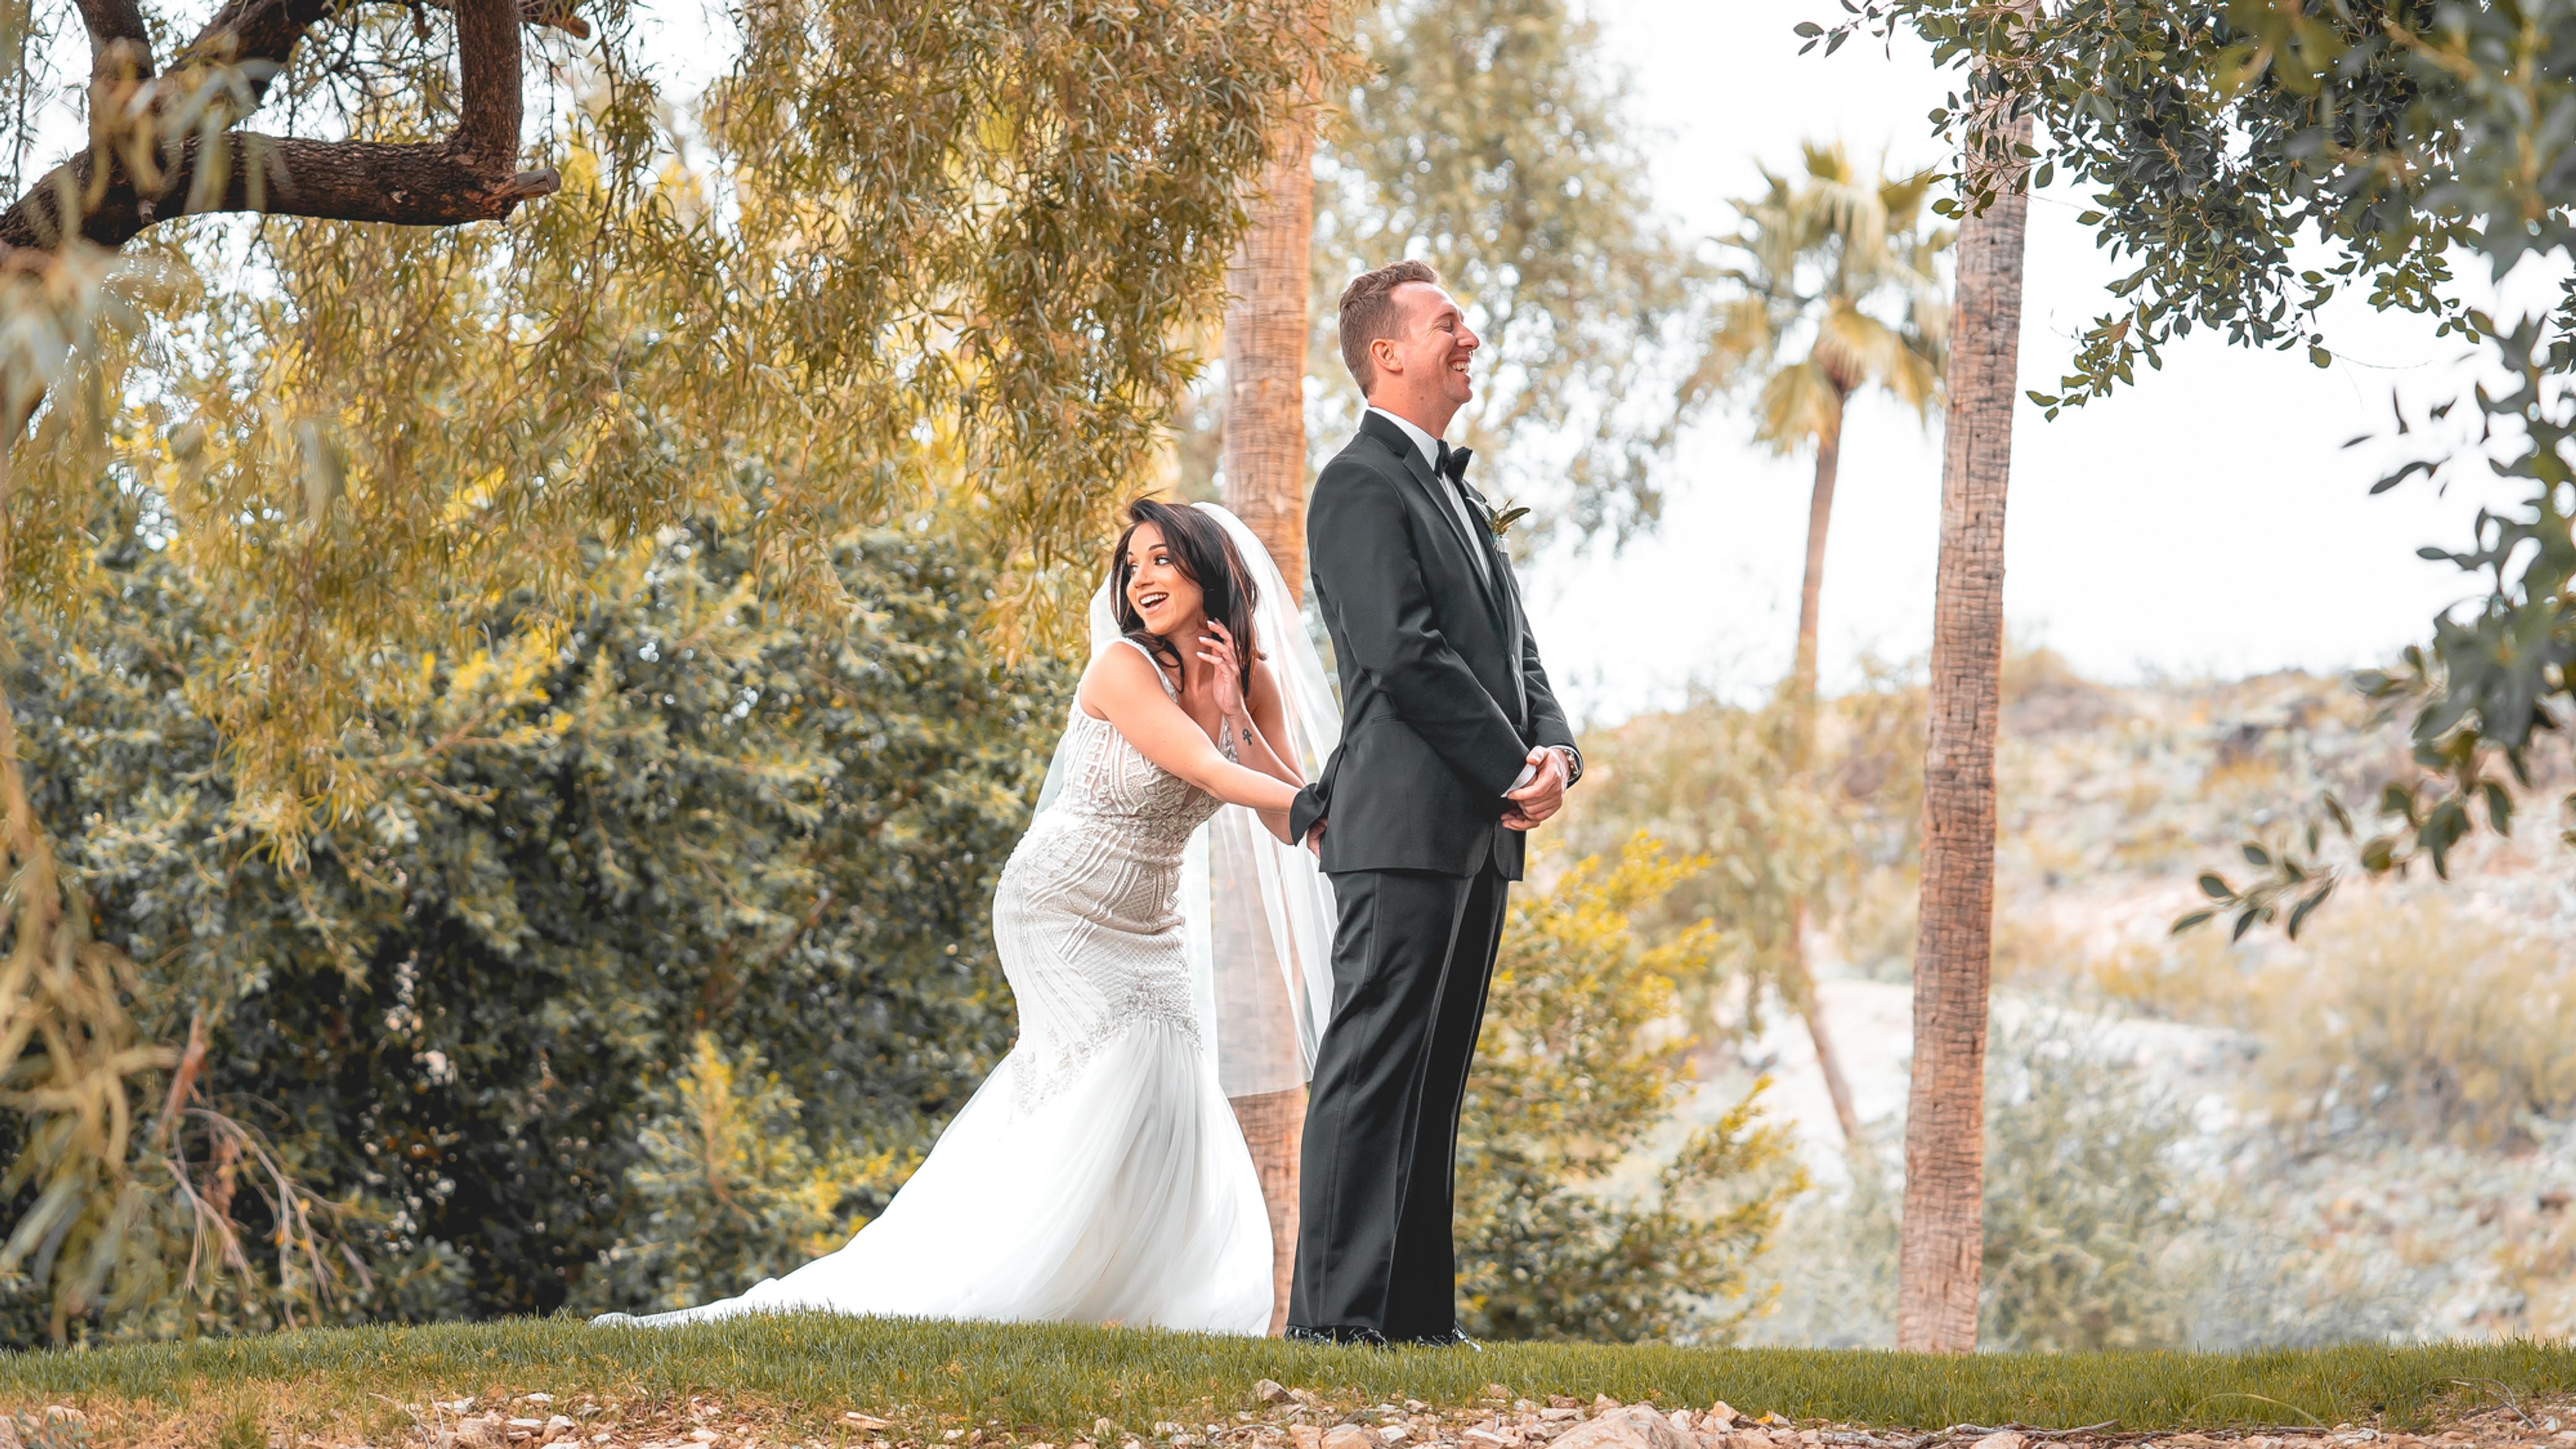 WEDDING PHOTOGRAPHY   Full Day